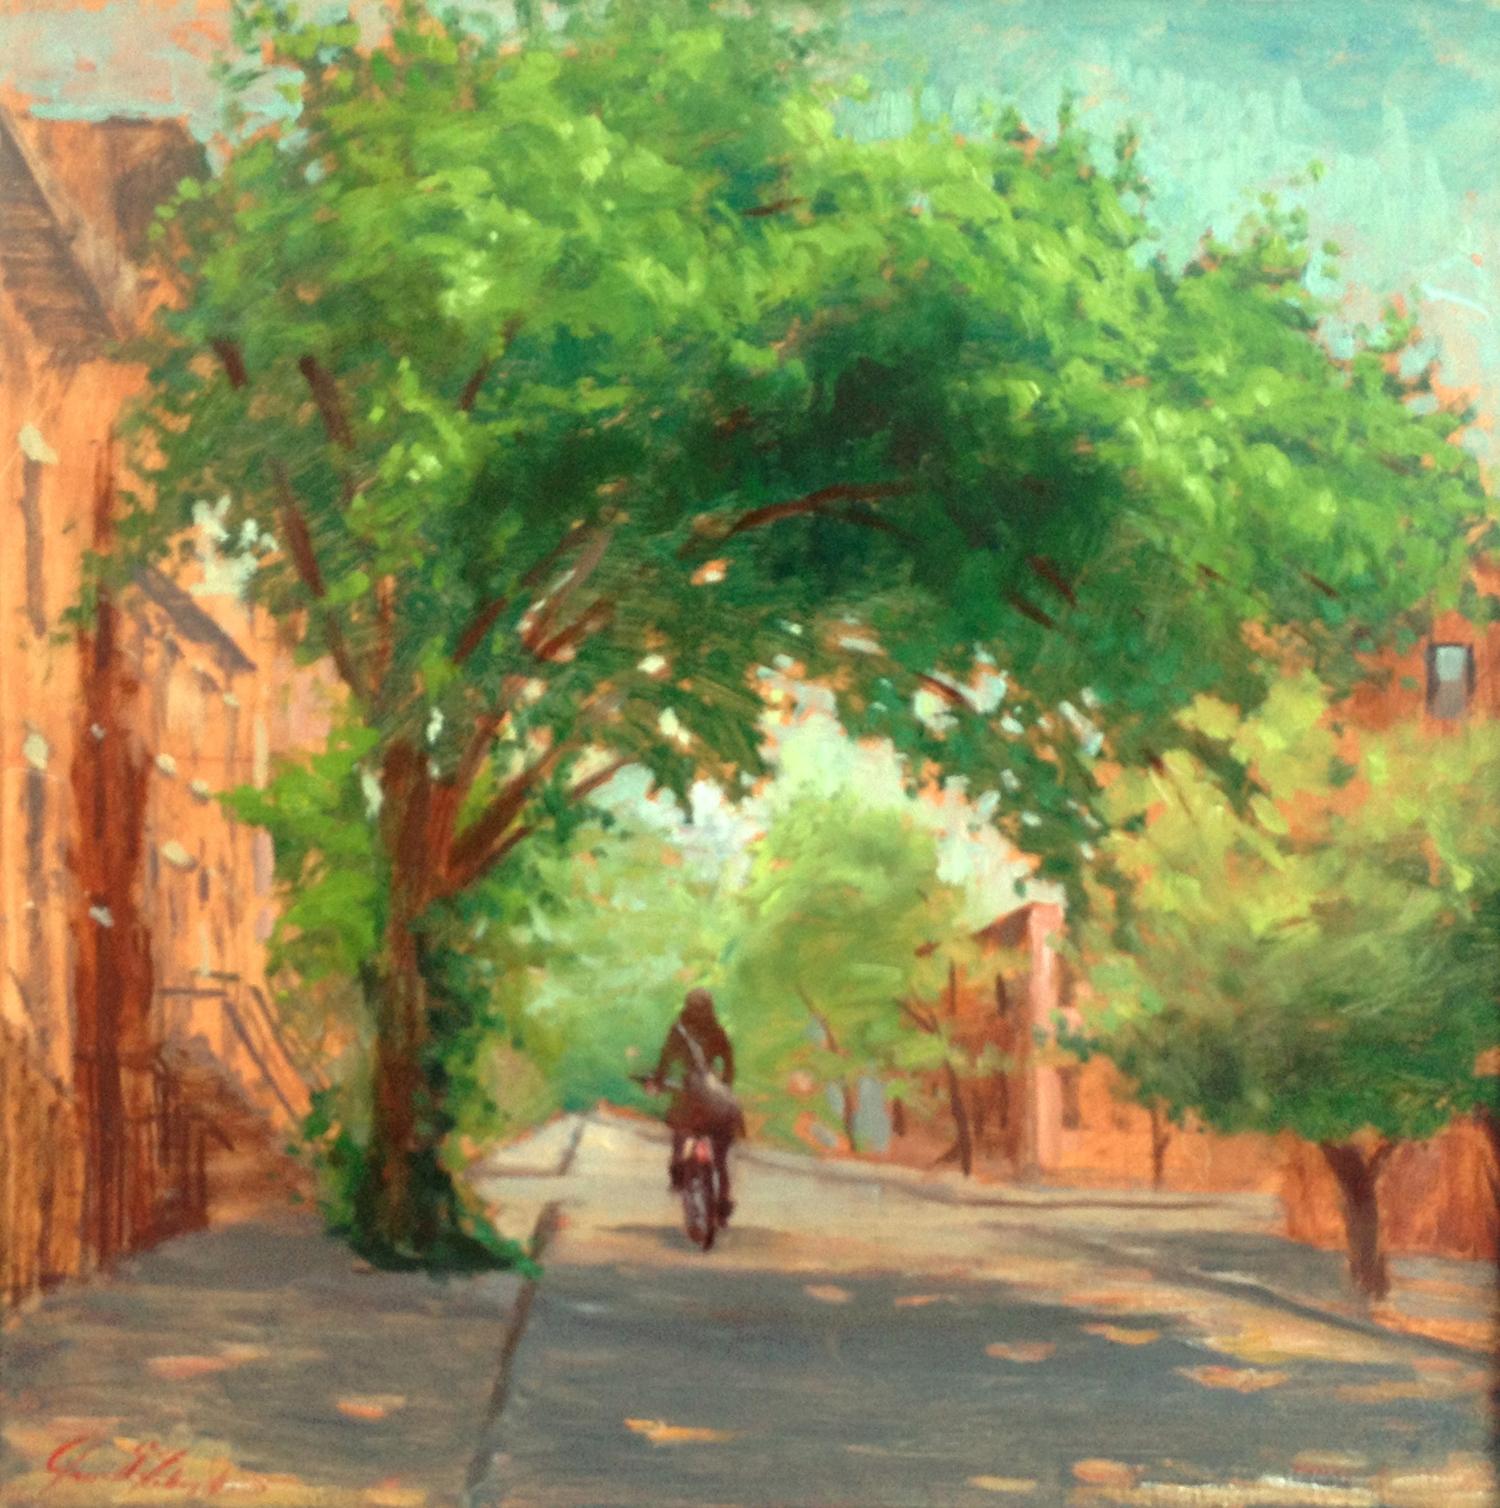 W Callery Pear On 5th Street-Dalrymple-18x18-oil on canvas-2010-SOLD.jpg